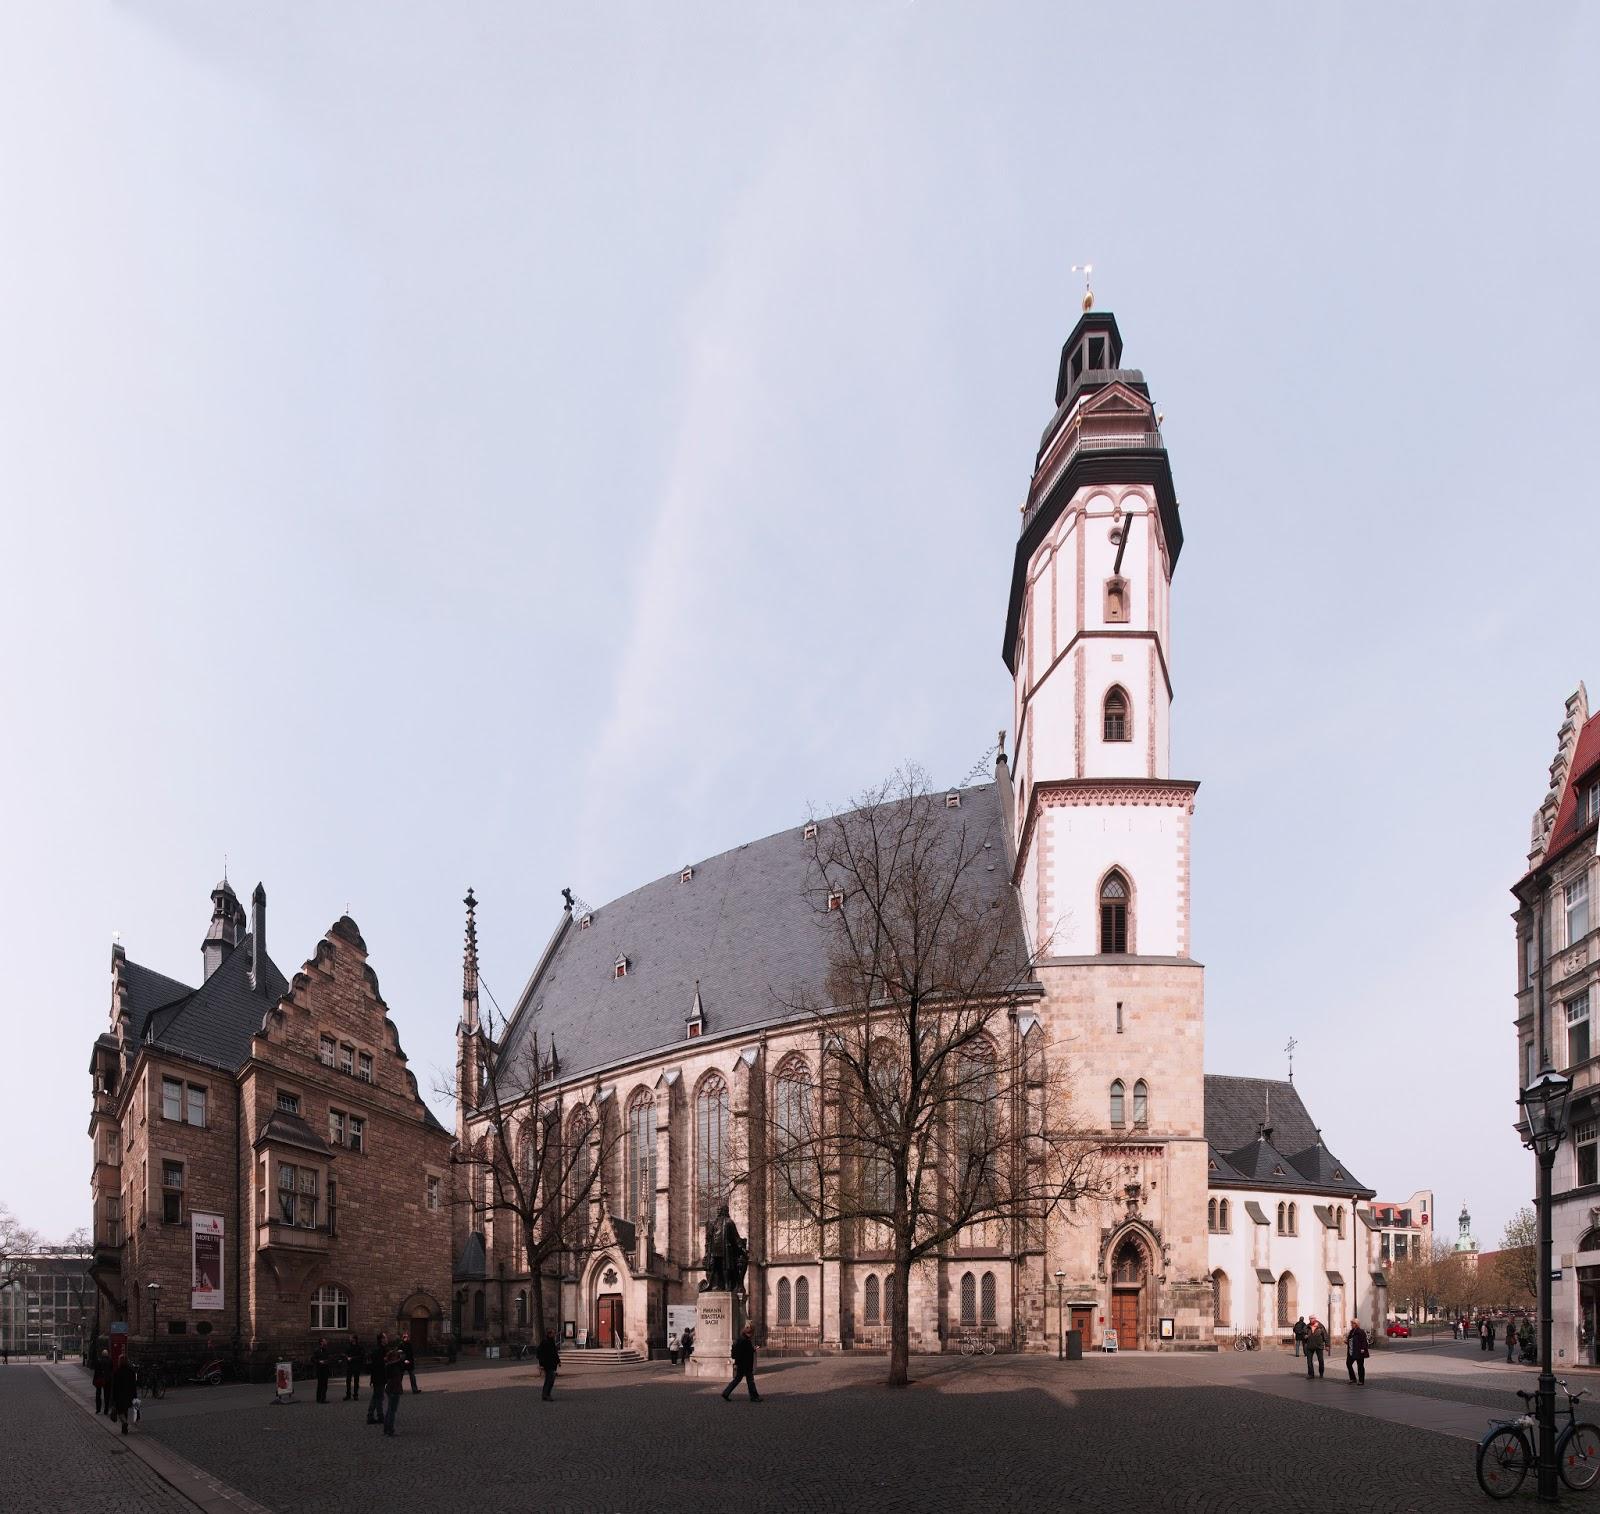 Panorama View of Thomaskirche